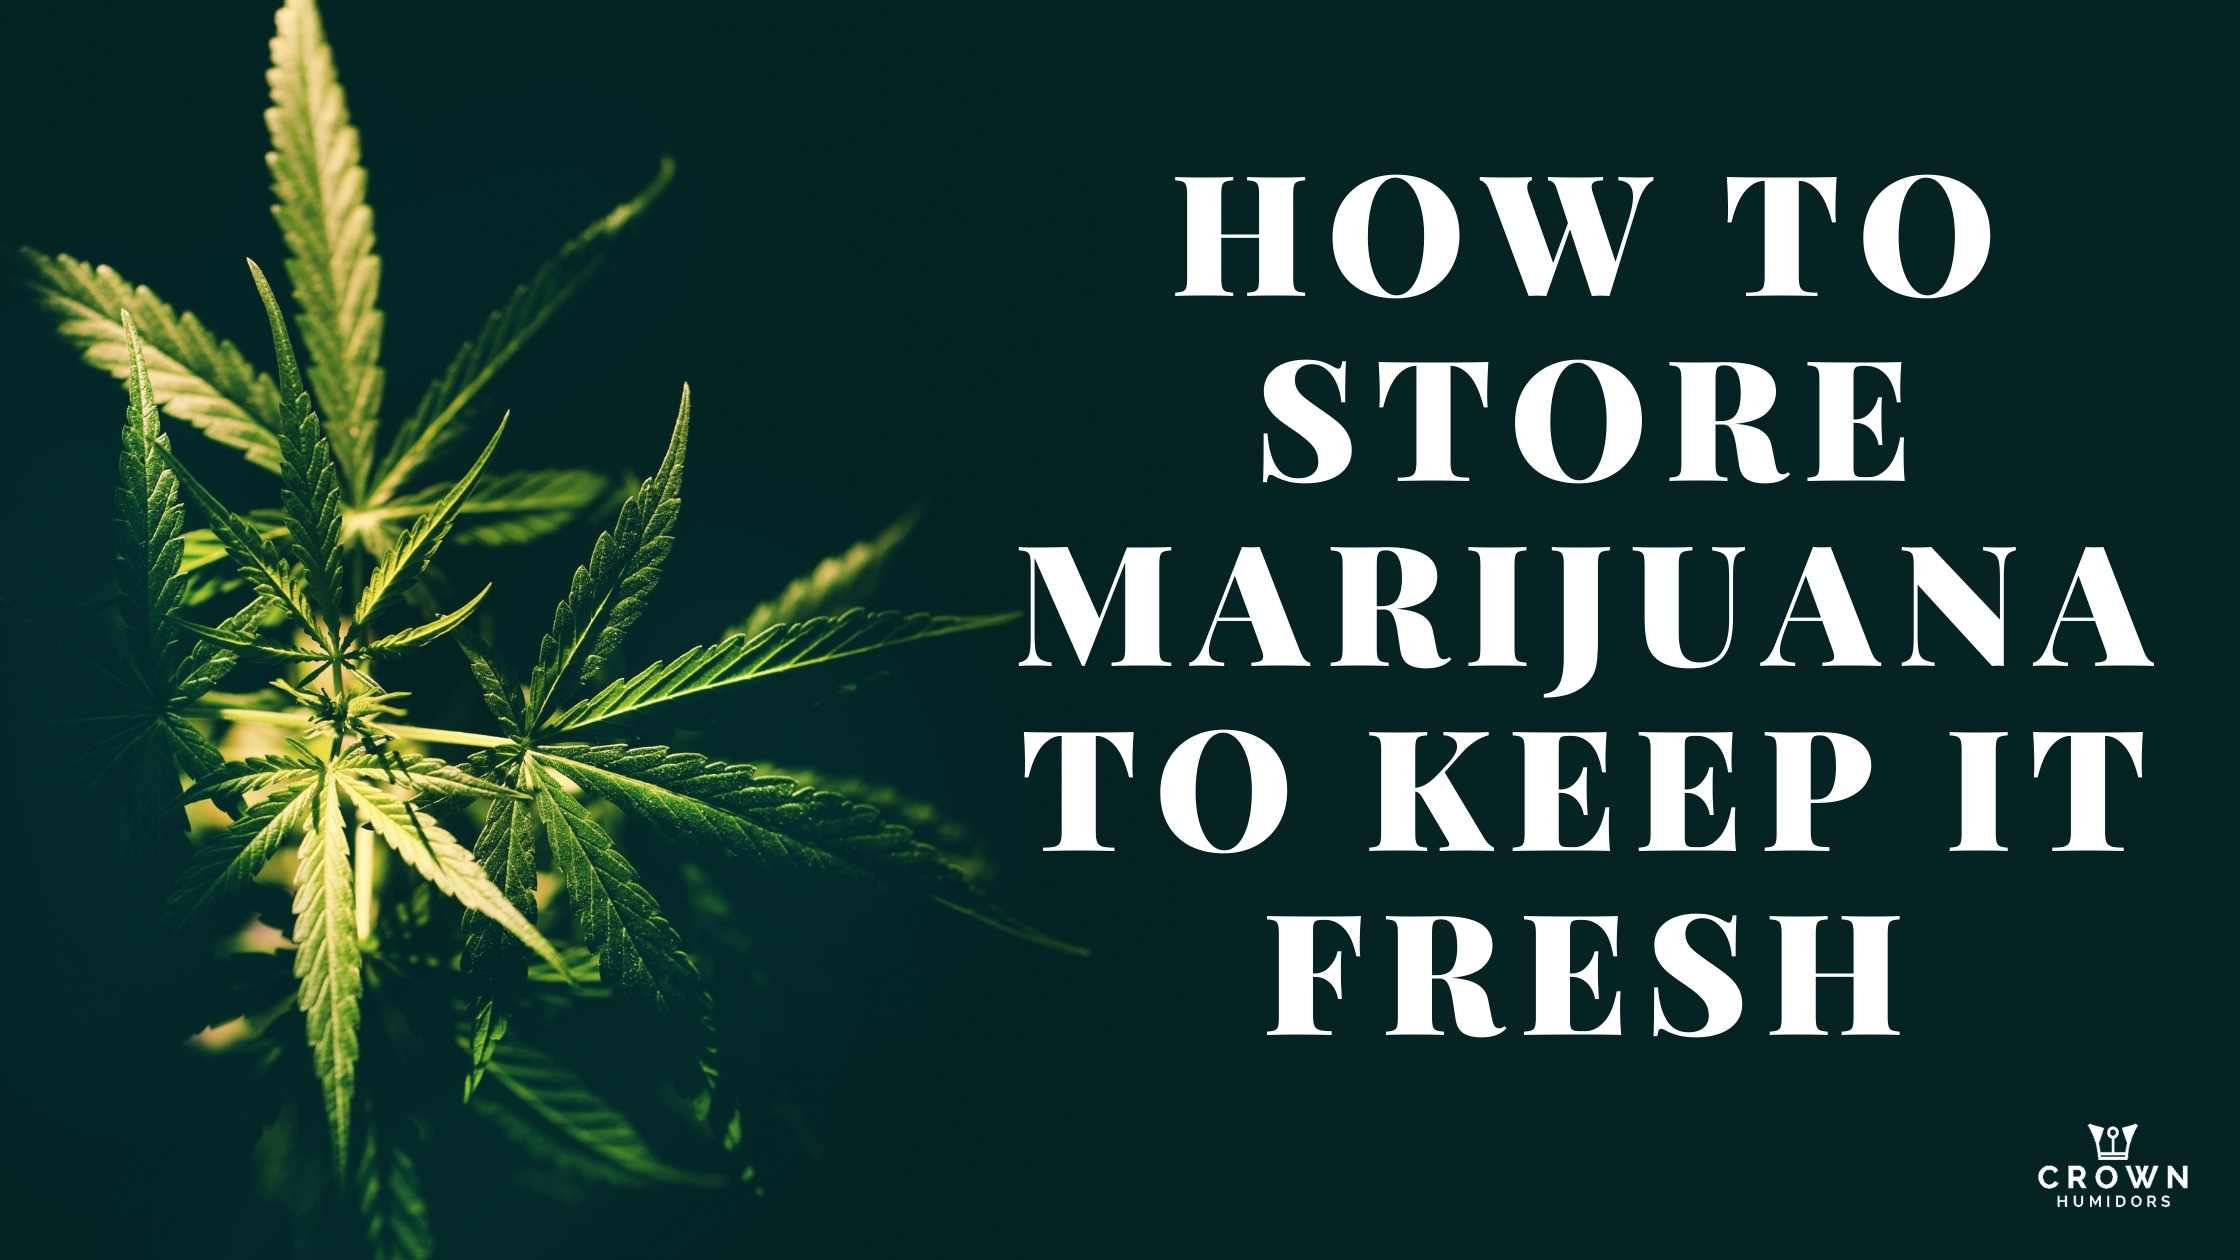 How to Store Marijuana to keep it fresh